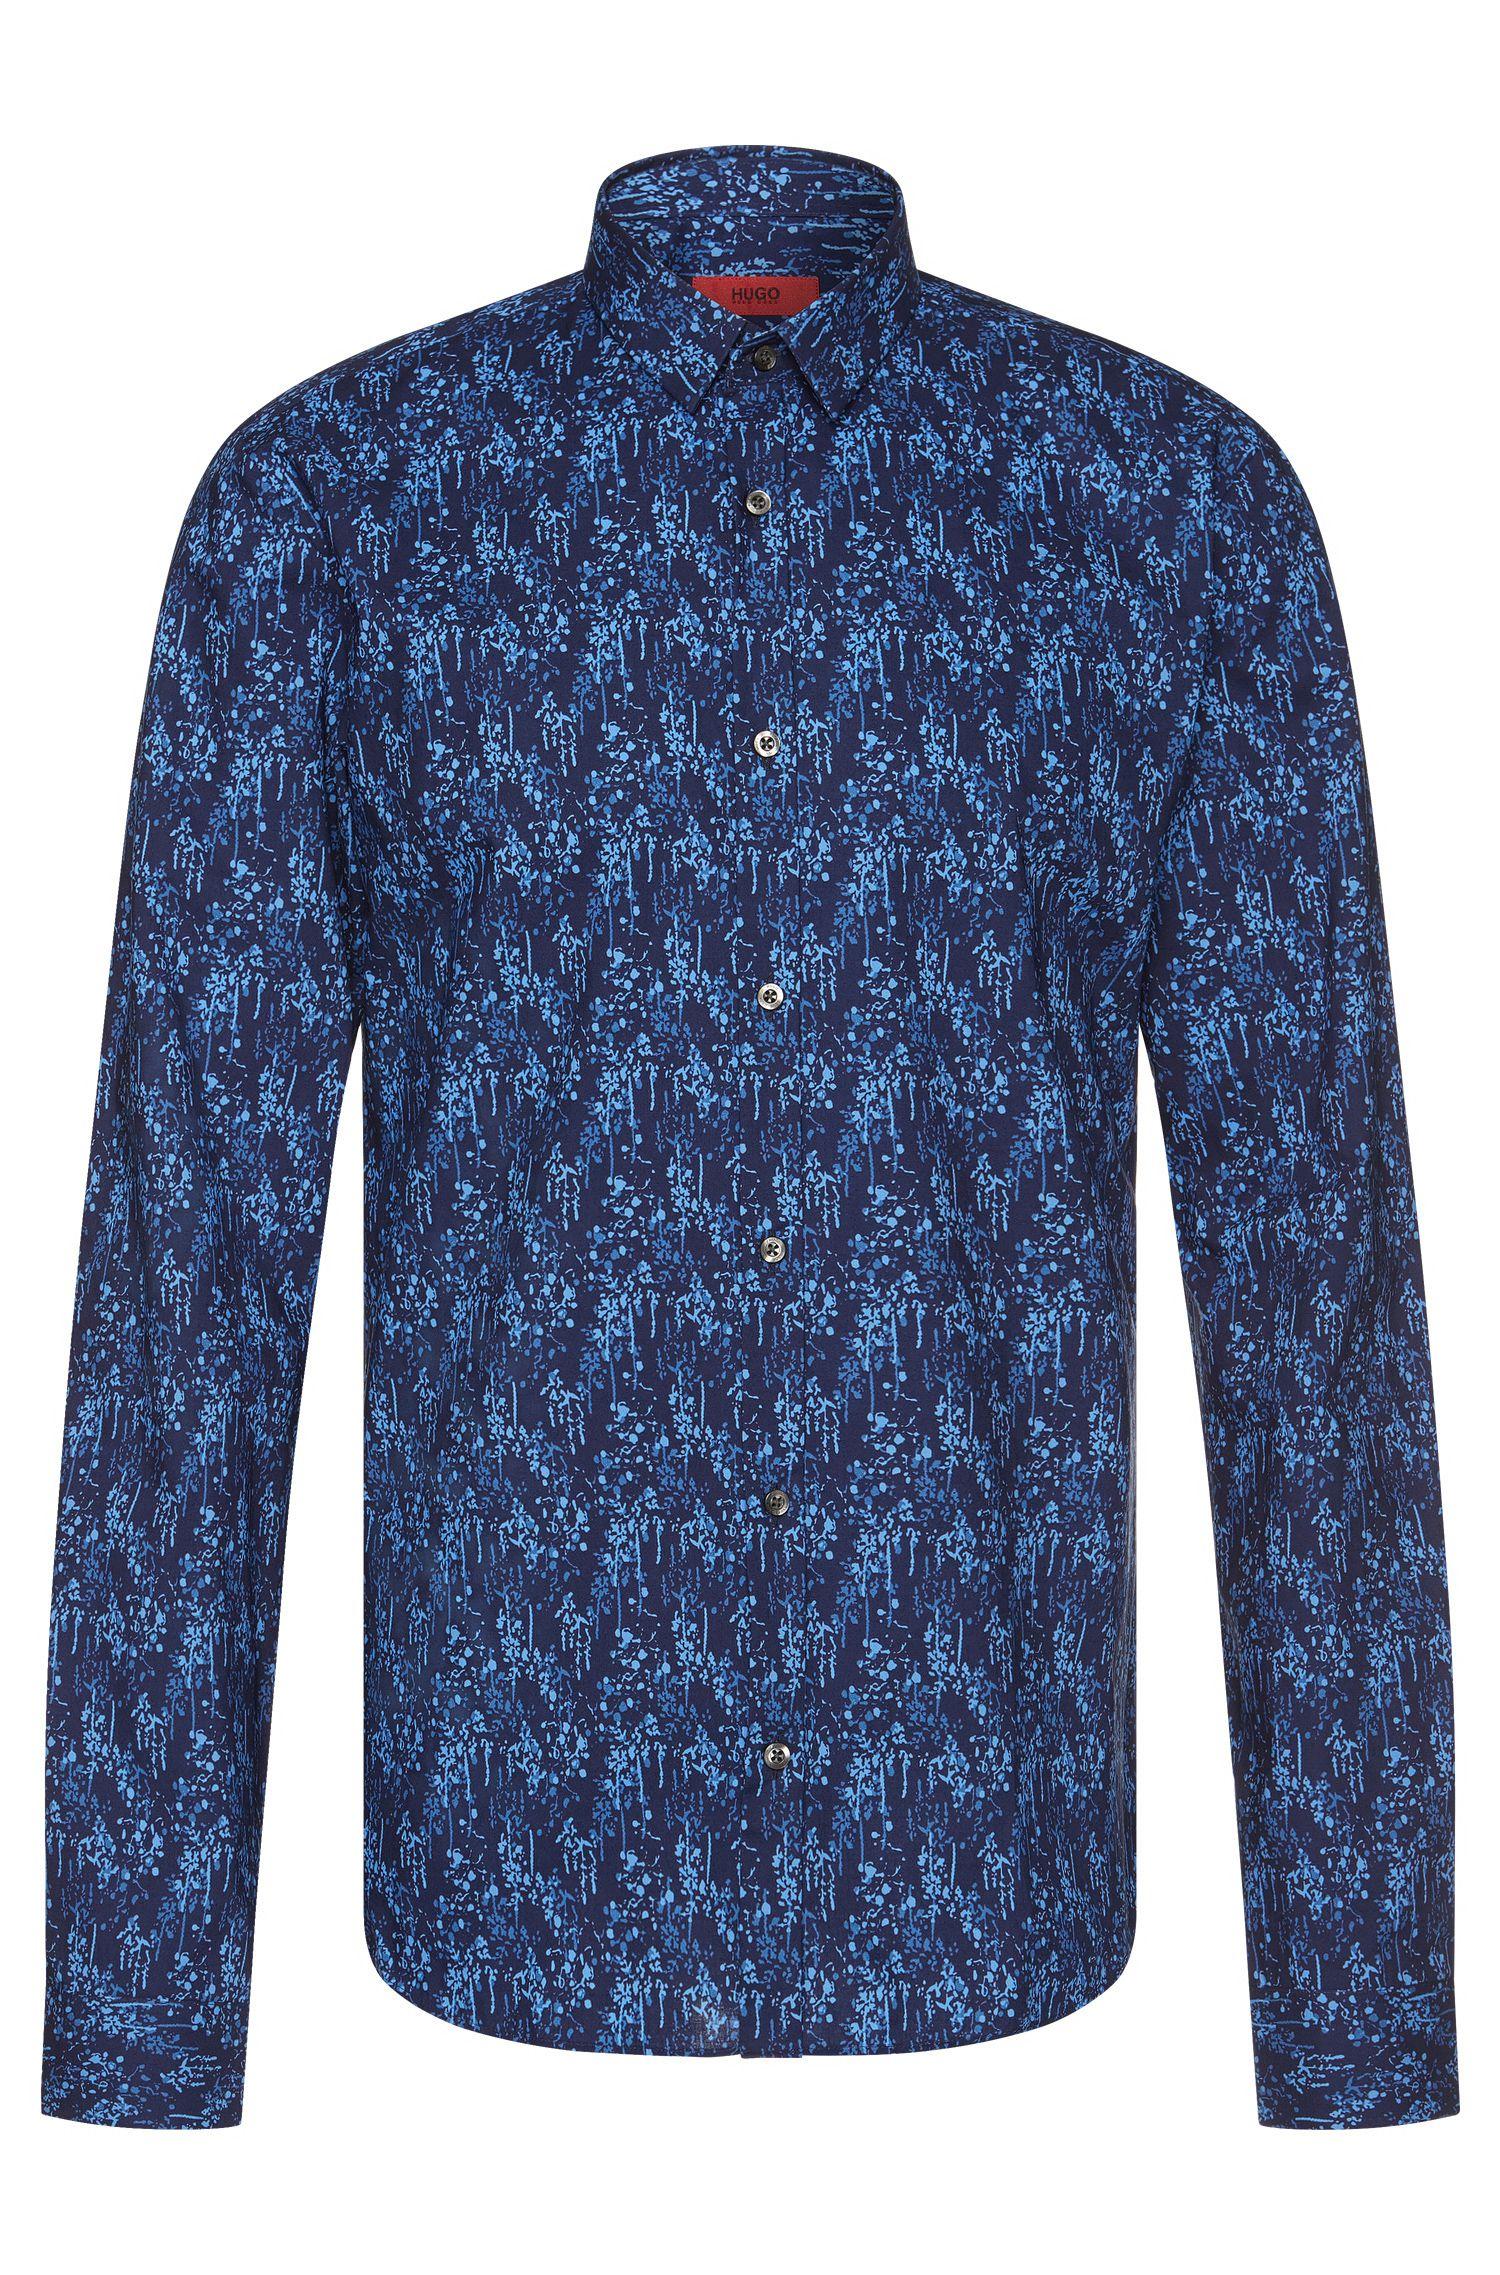 'Ero'   Slim Fit, Stretch Cotton Printed Button Down Shirt